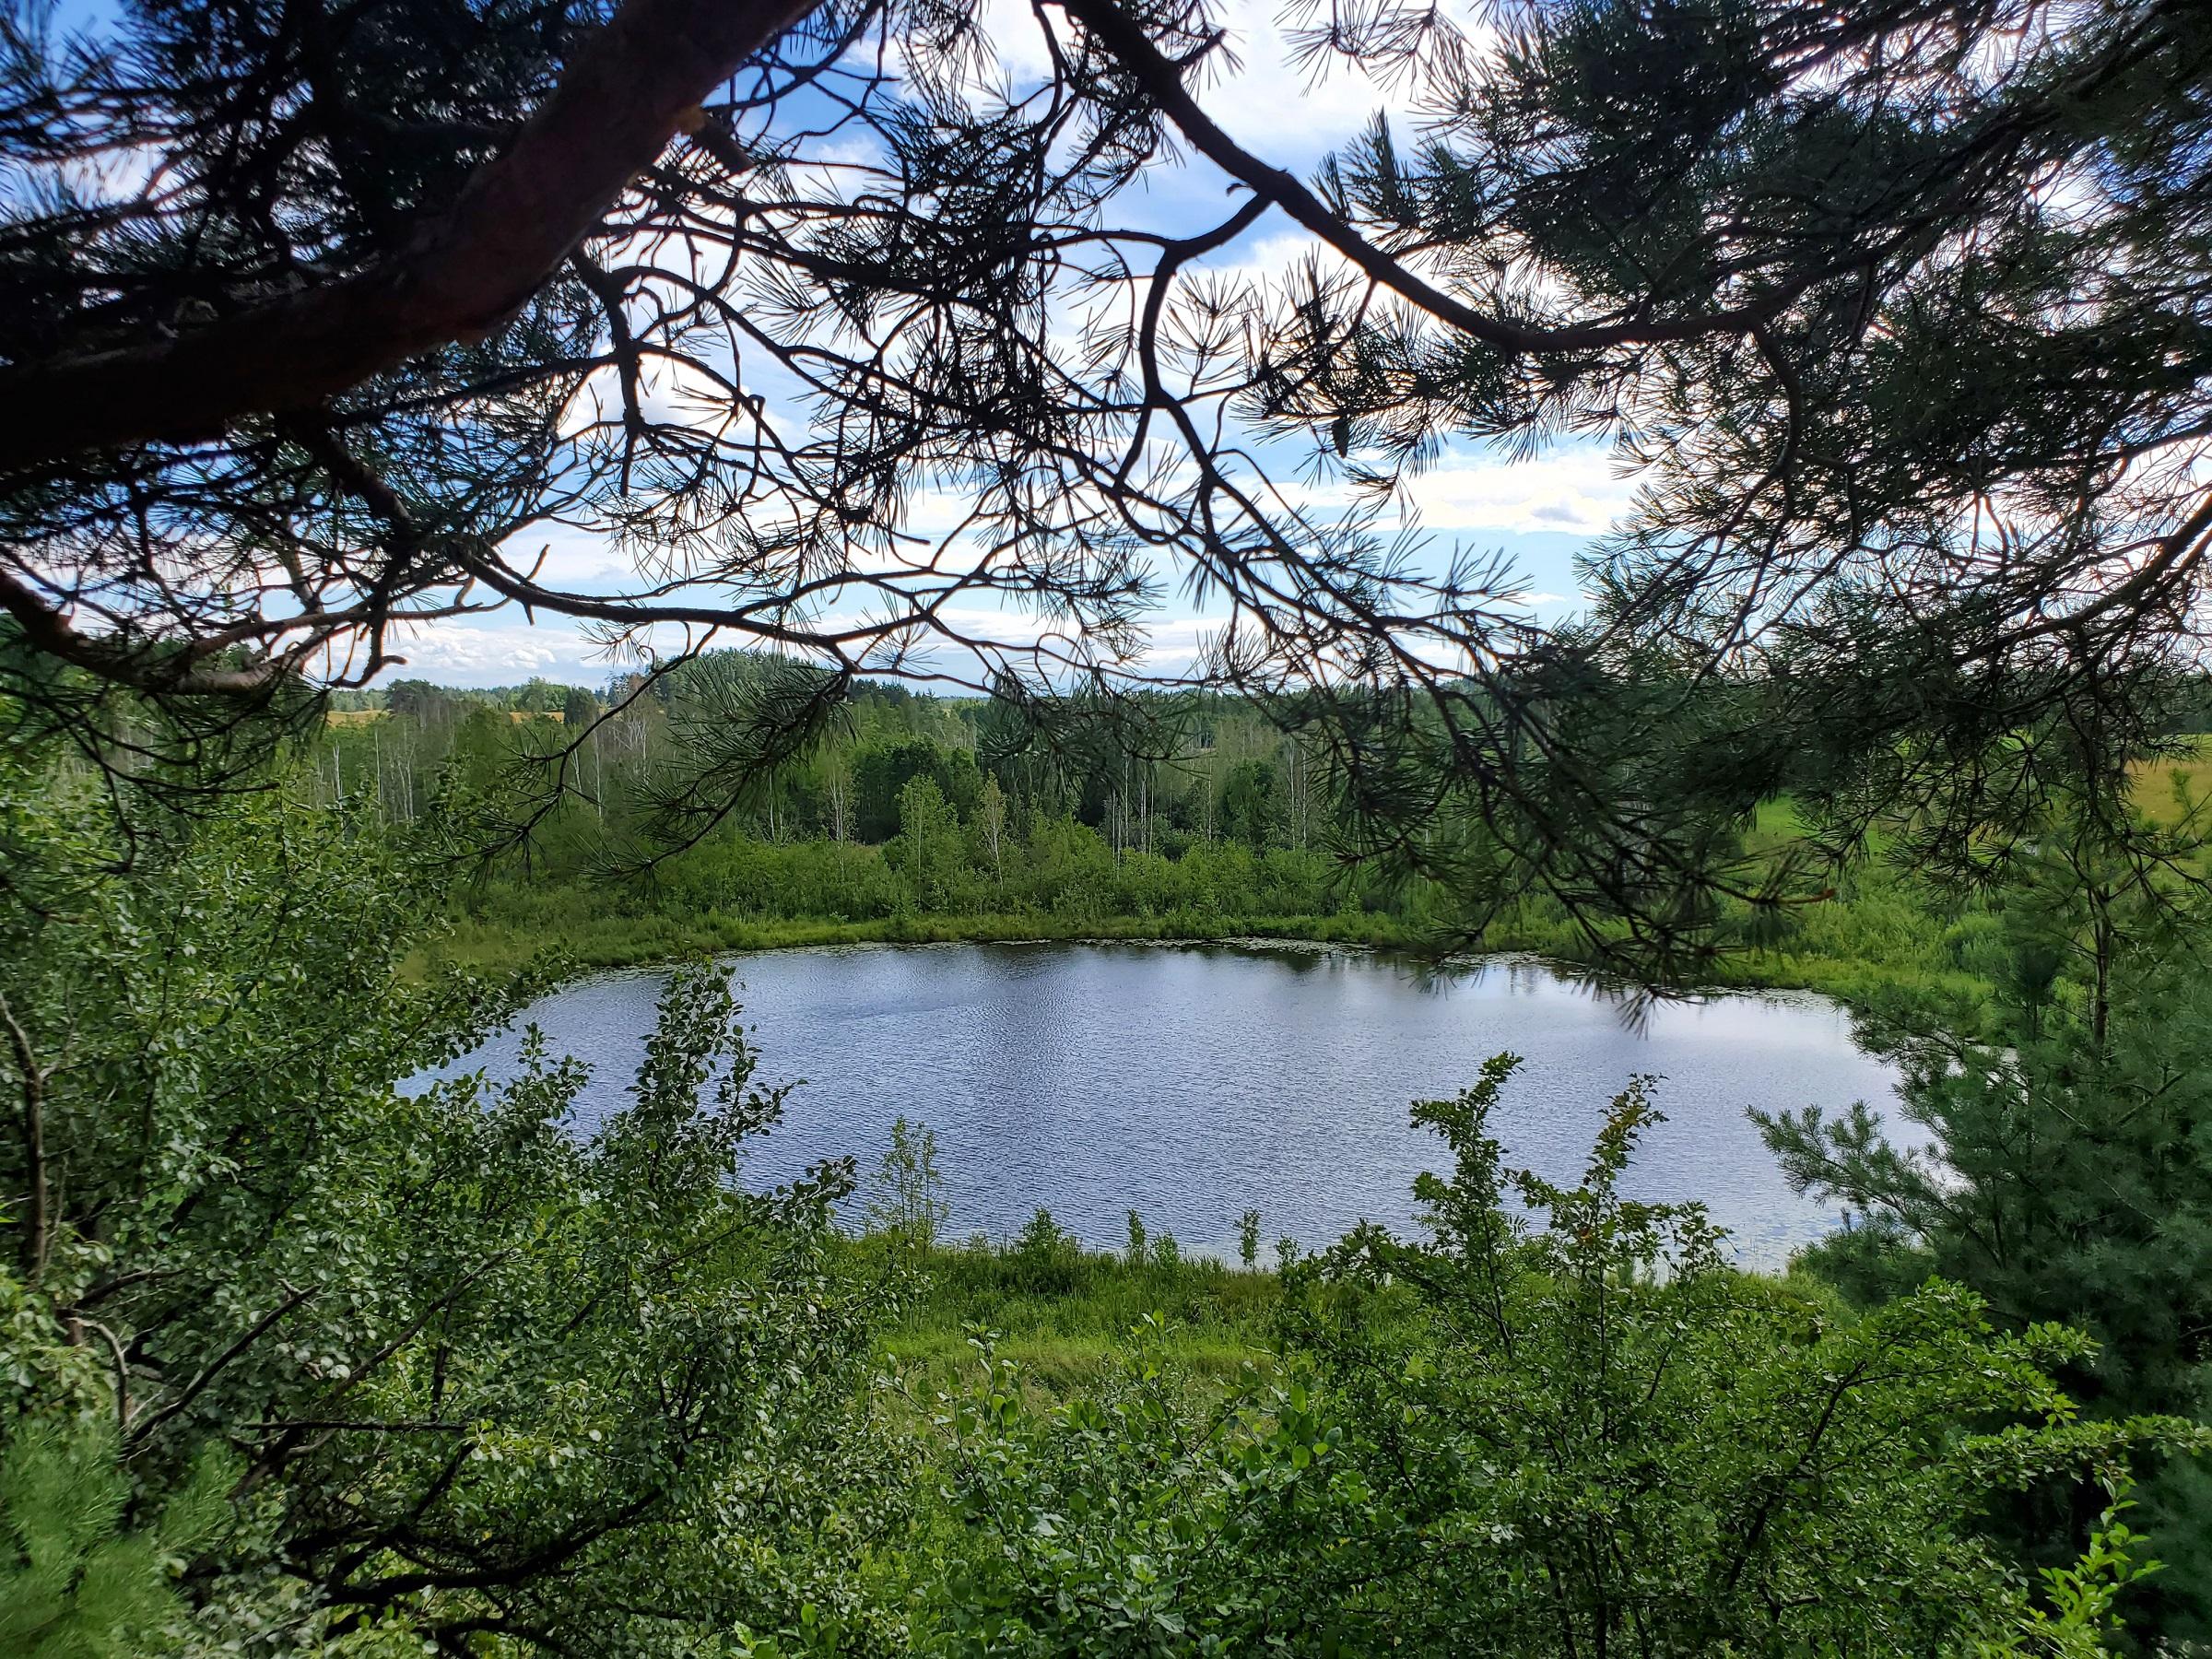 20200730 151622 - Озеро «Божье око»